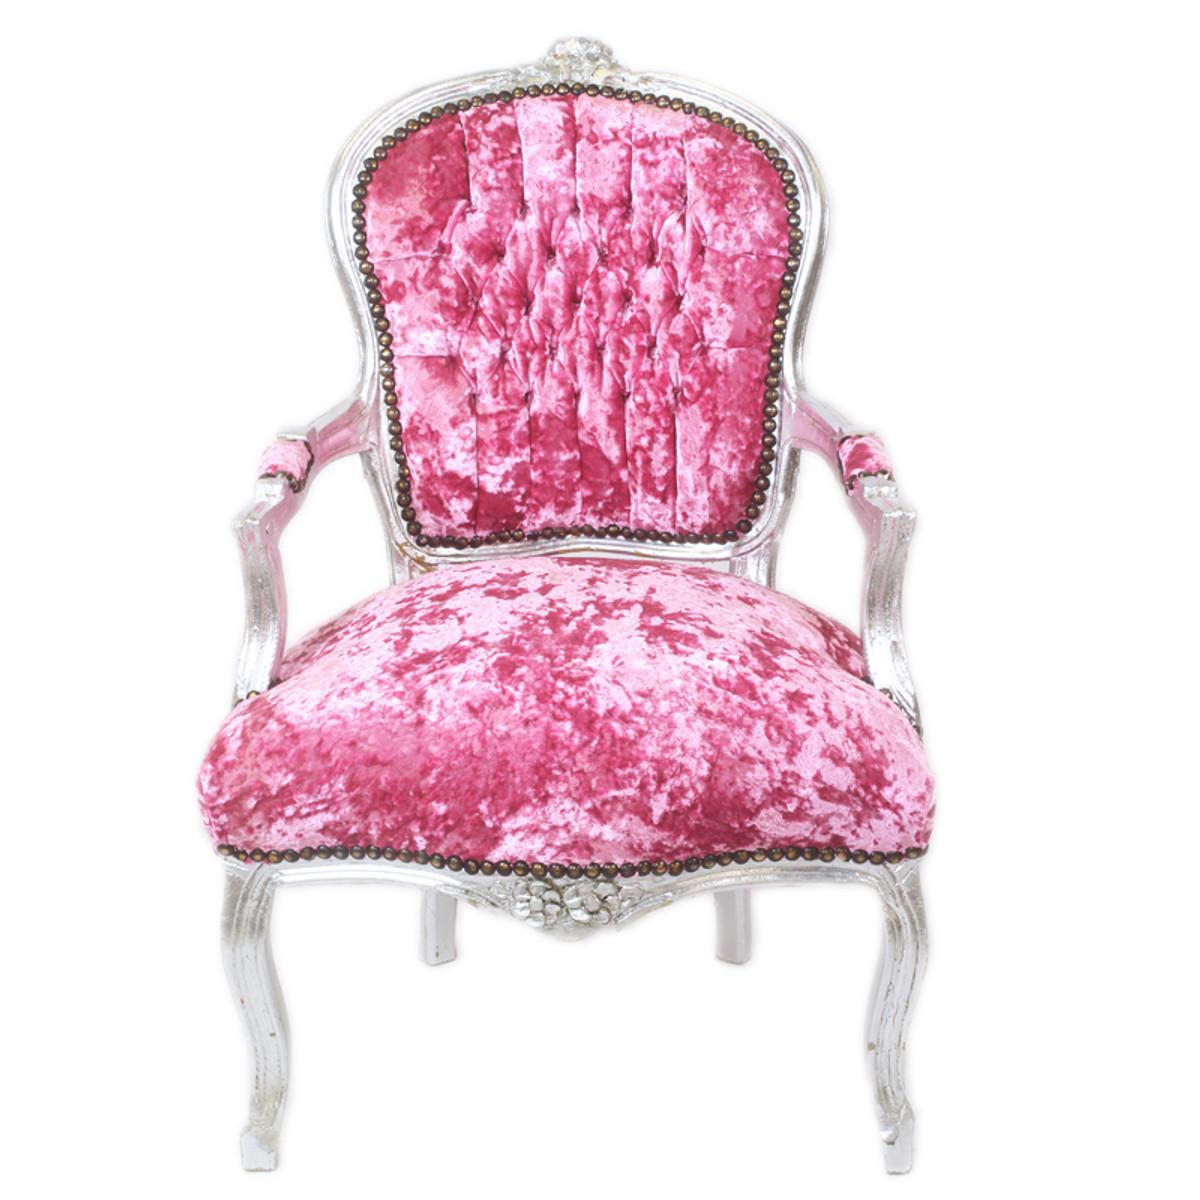 Casa padrino barock salon stuhl pink velour stoff silber antik design m bel st hle barock - Stoel dineren baroque ...